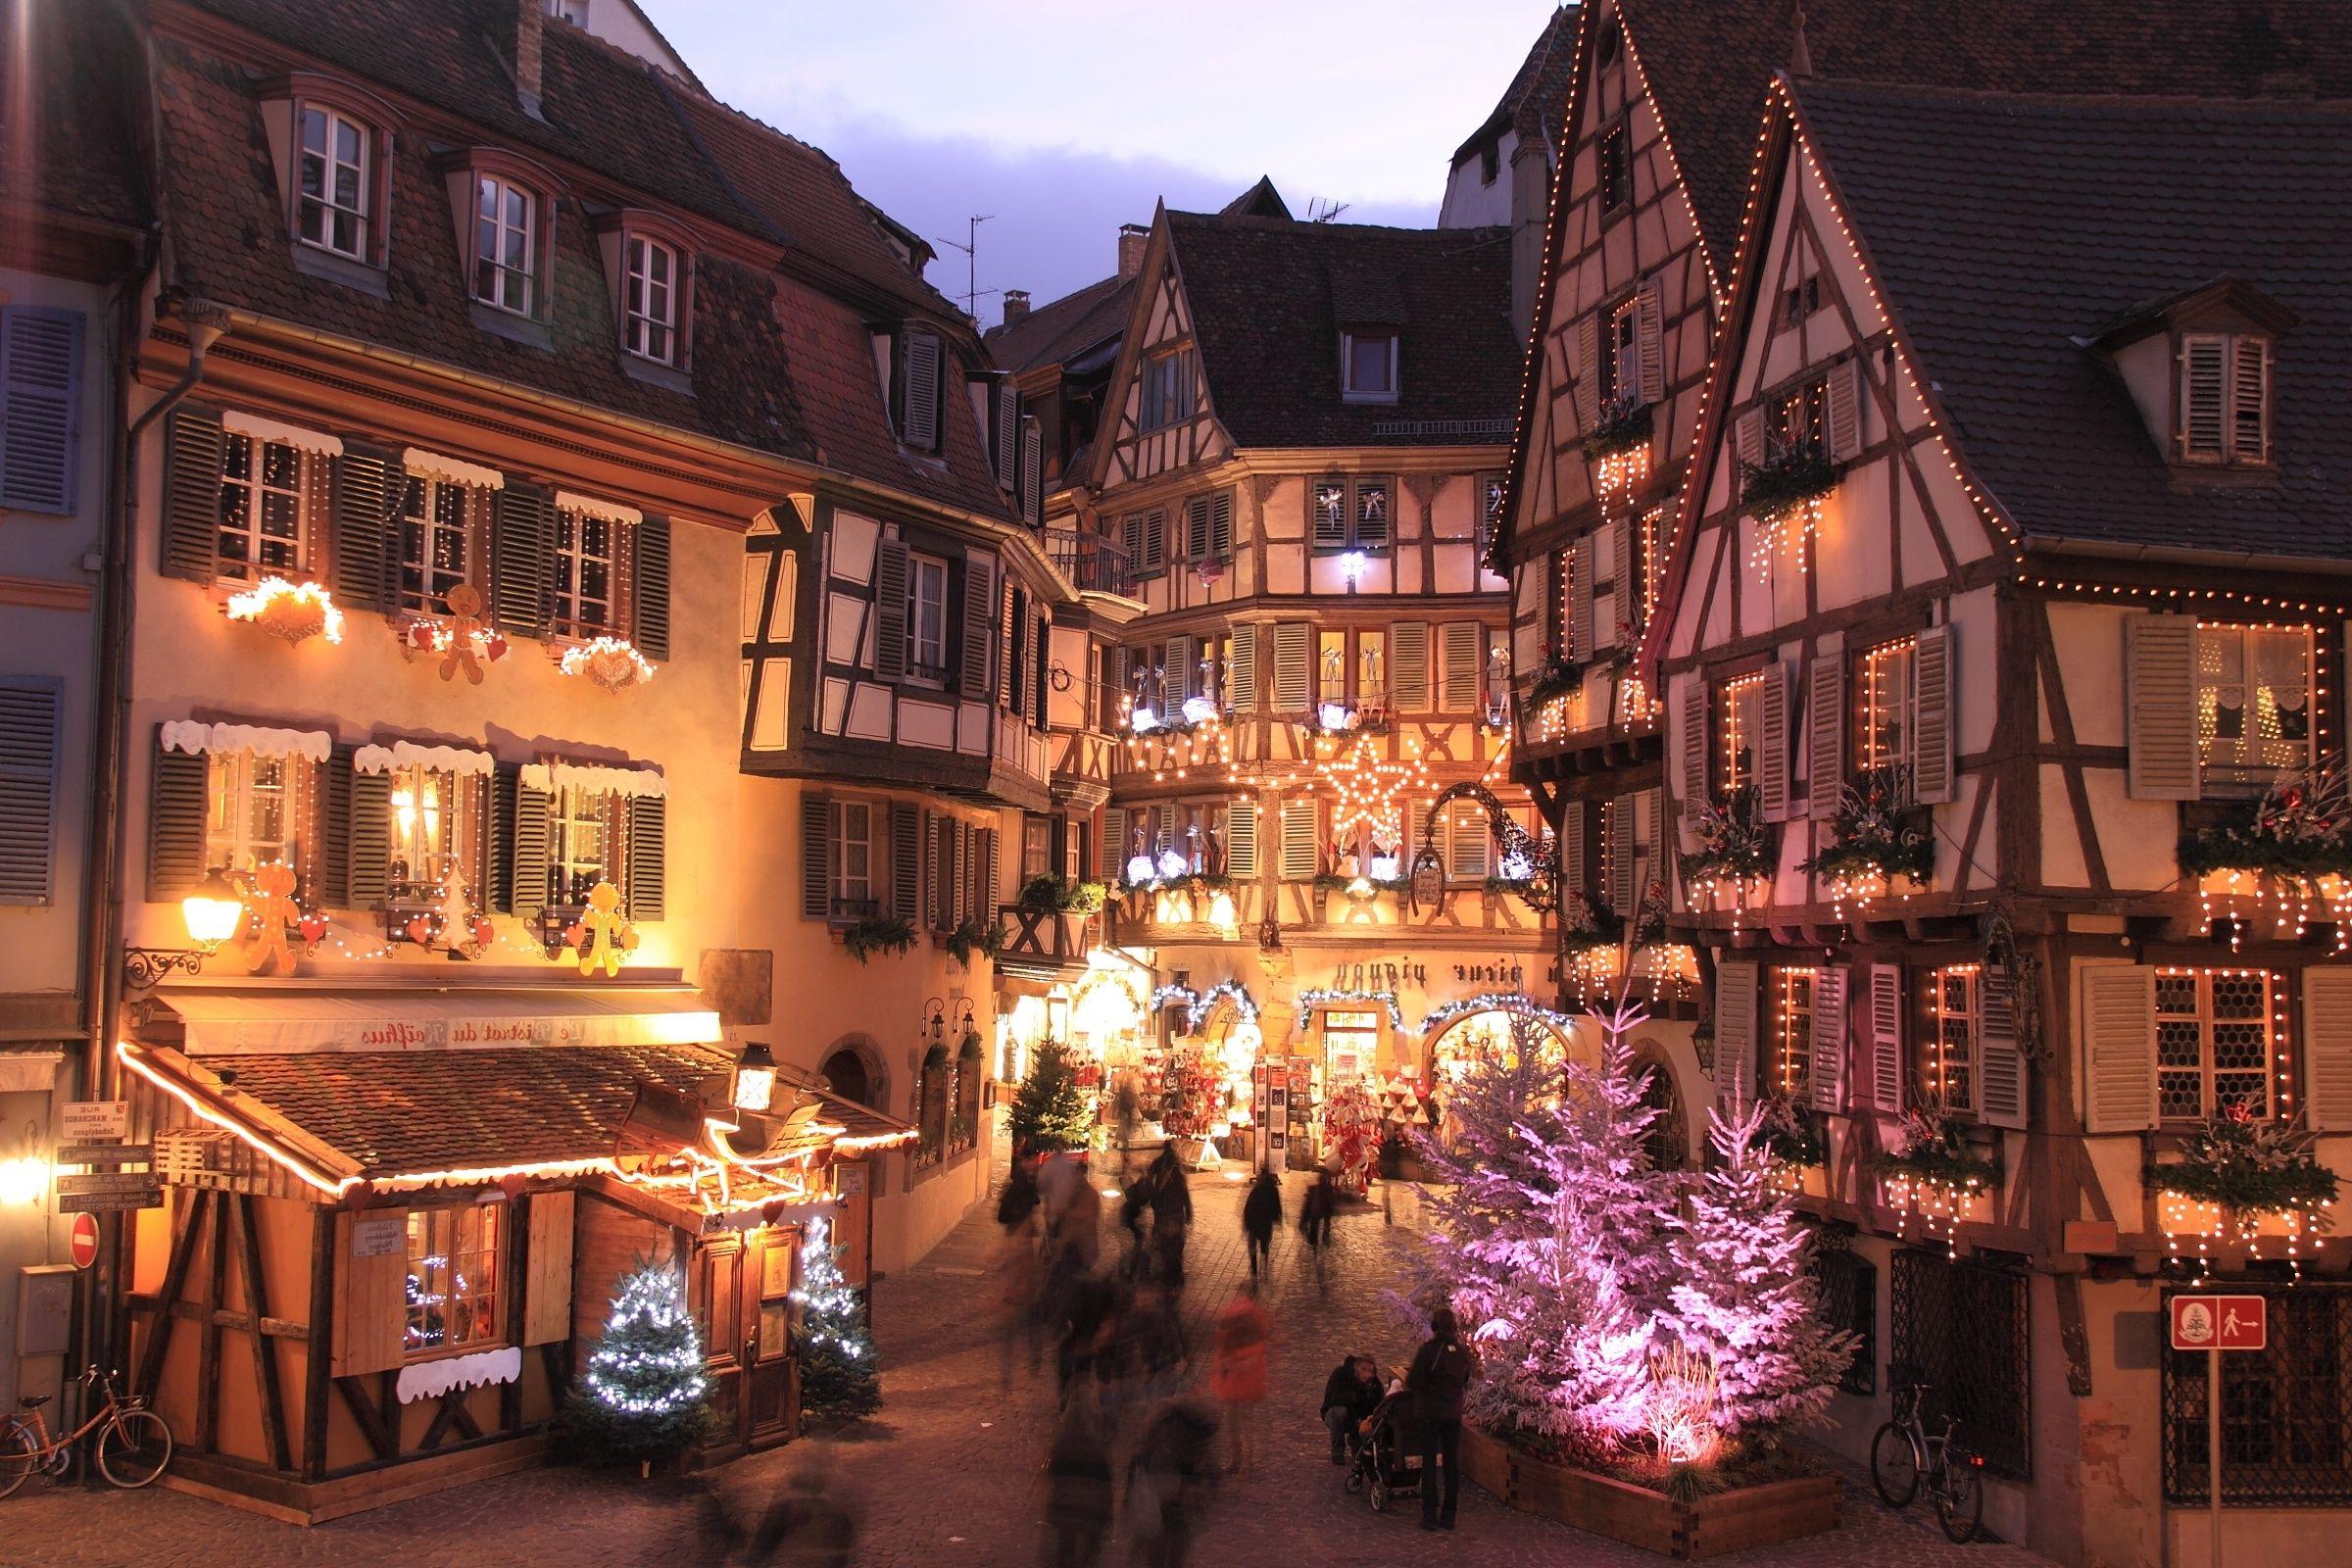 Christmas market in Strasbourg, Alsace, France | Best christmas markets europe, Best christmas markets, Christmas markets europe